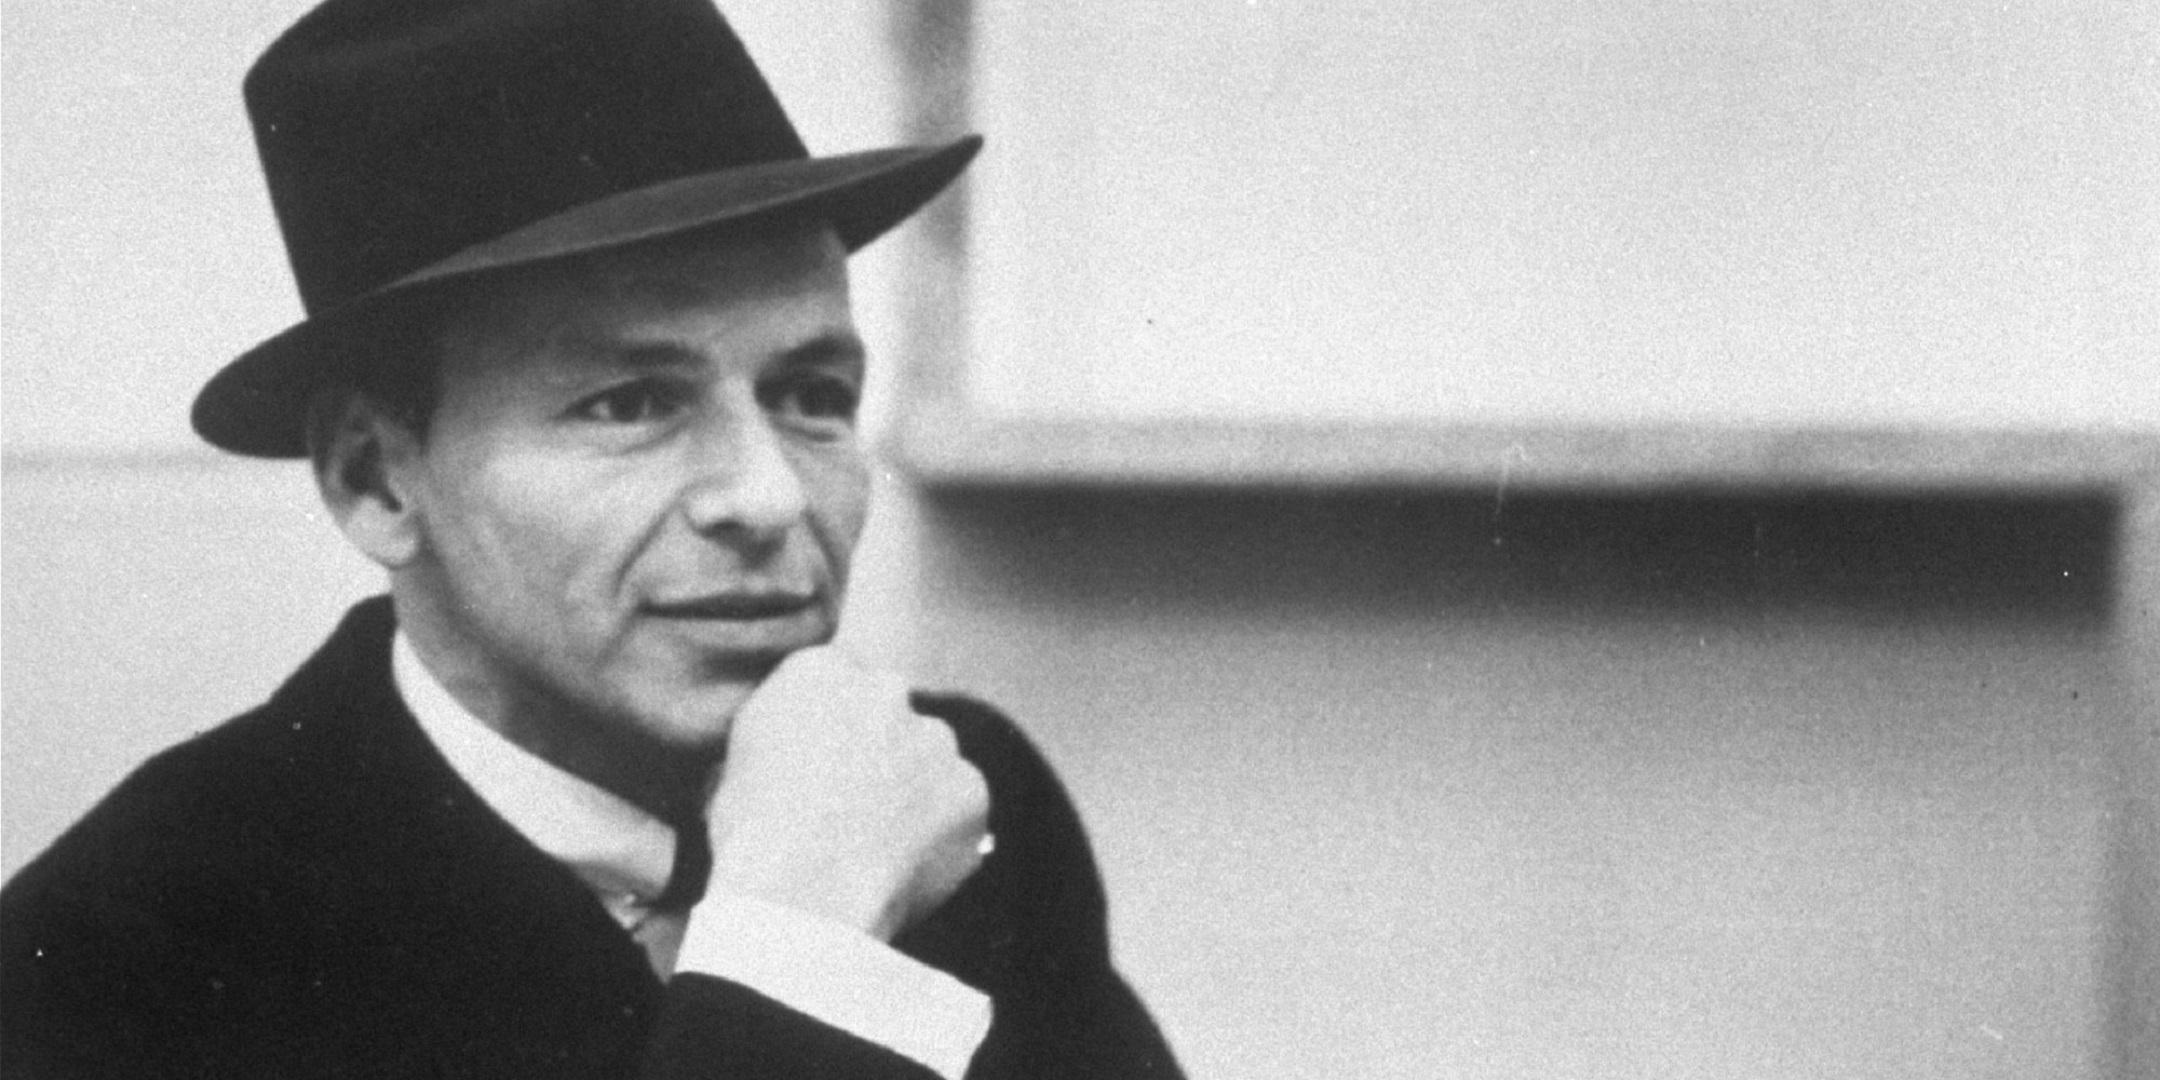 Frank Sinatra Background